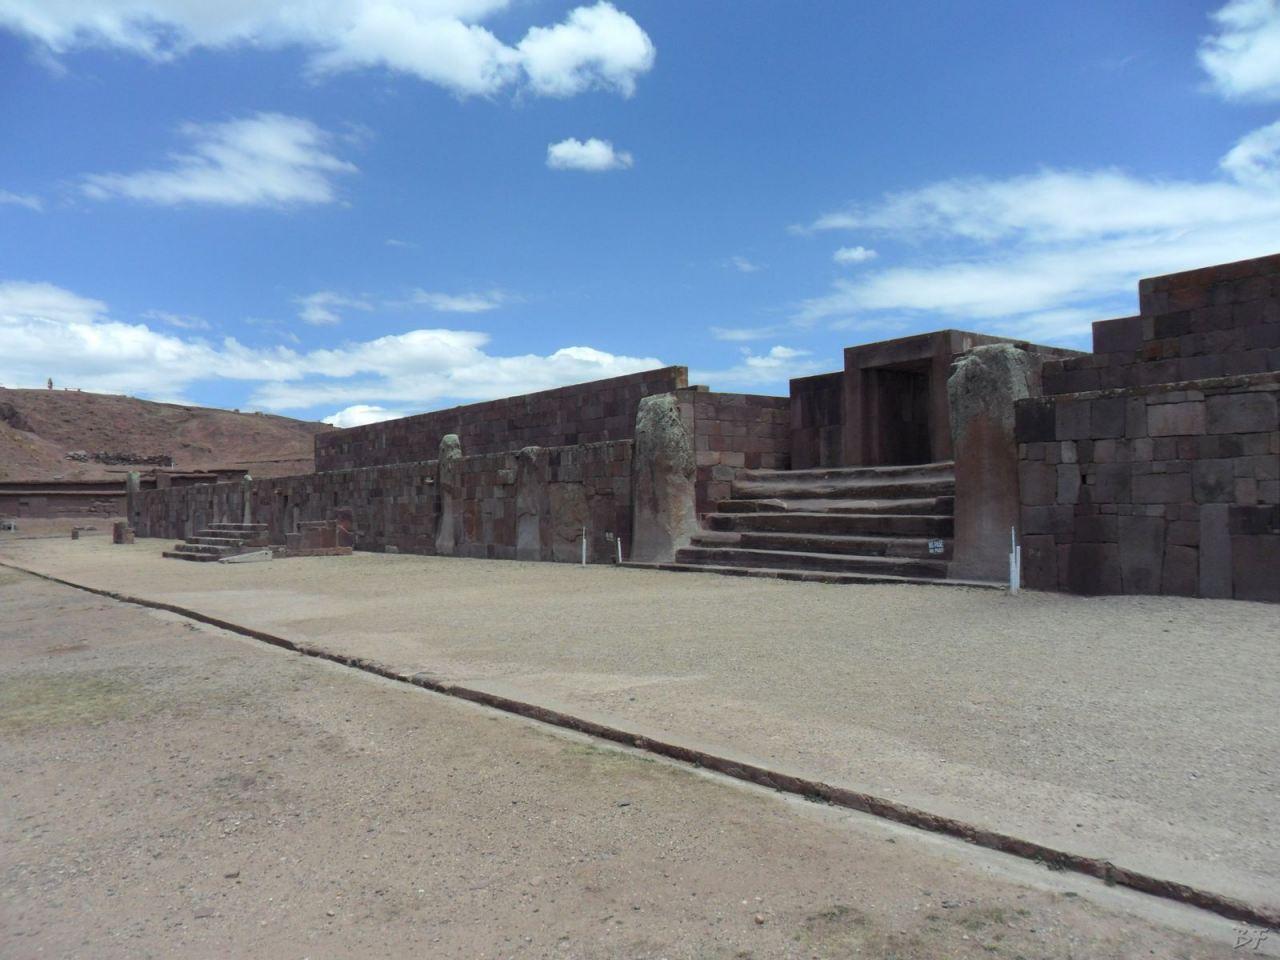 Sito-Megalitico-Piramide-Akapana-Kalasasaya-Menhir-Tiahuanaco-Bolivia-72